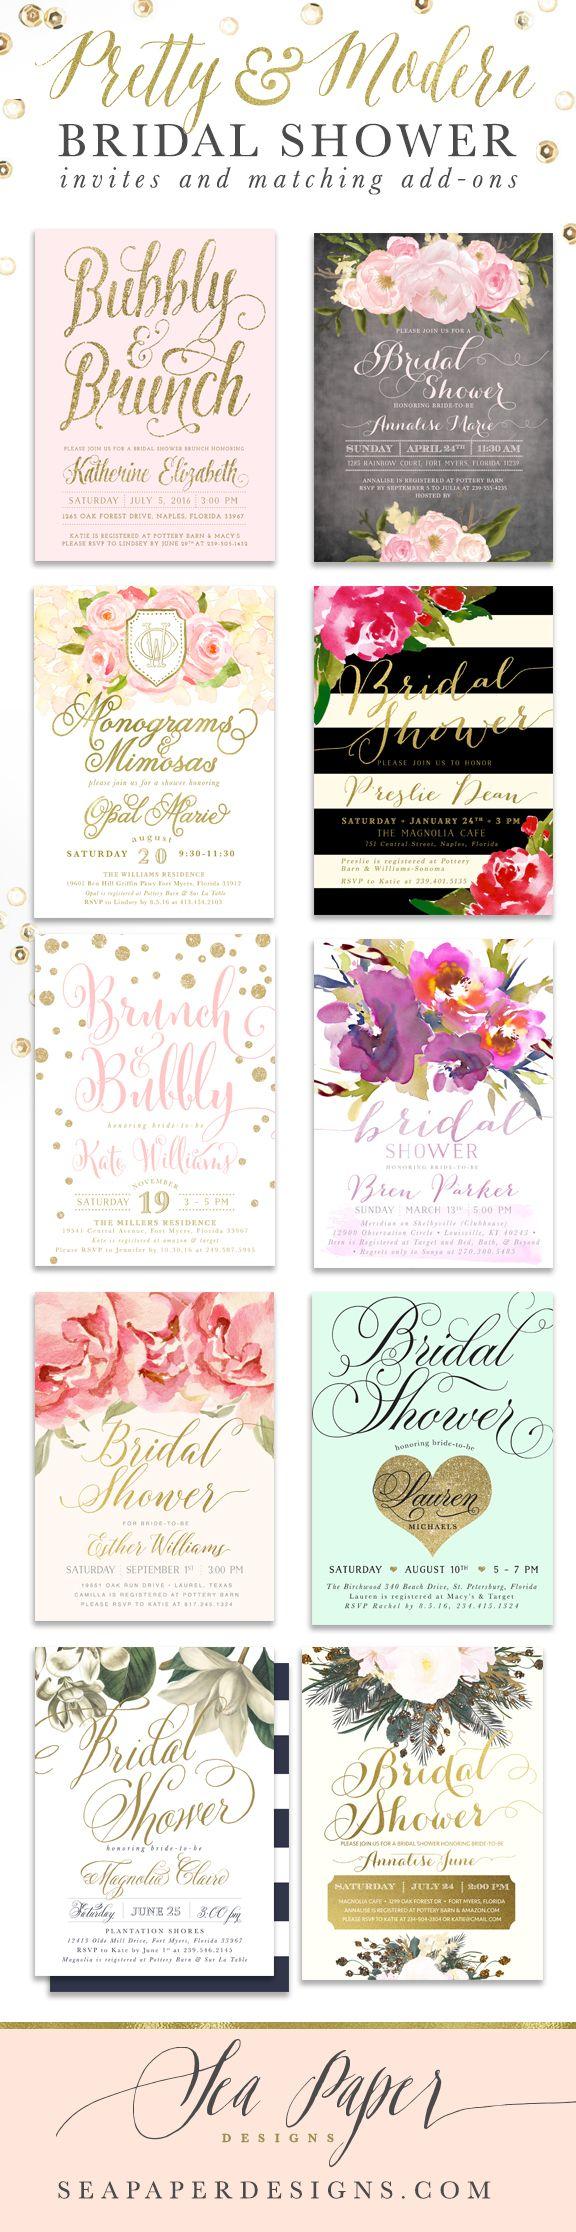 Pretty, Classy & Modern Bridal Shower Invitations ...